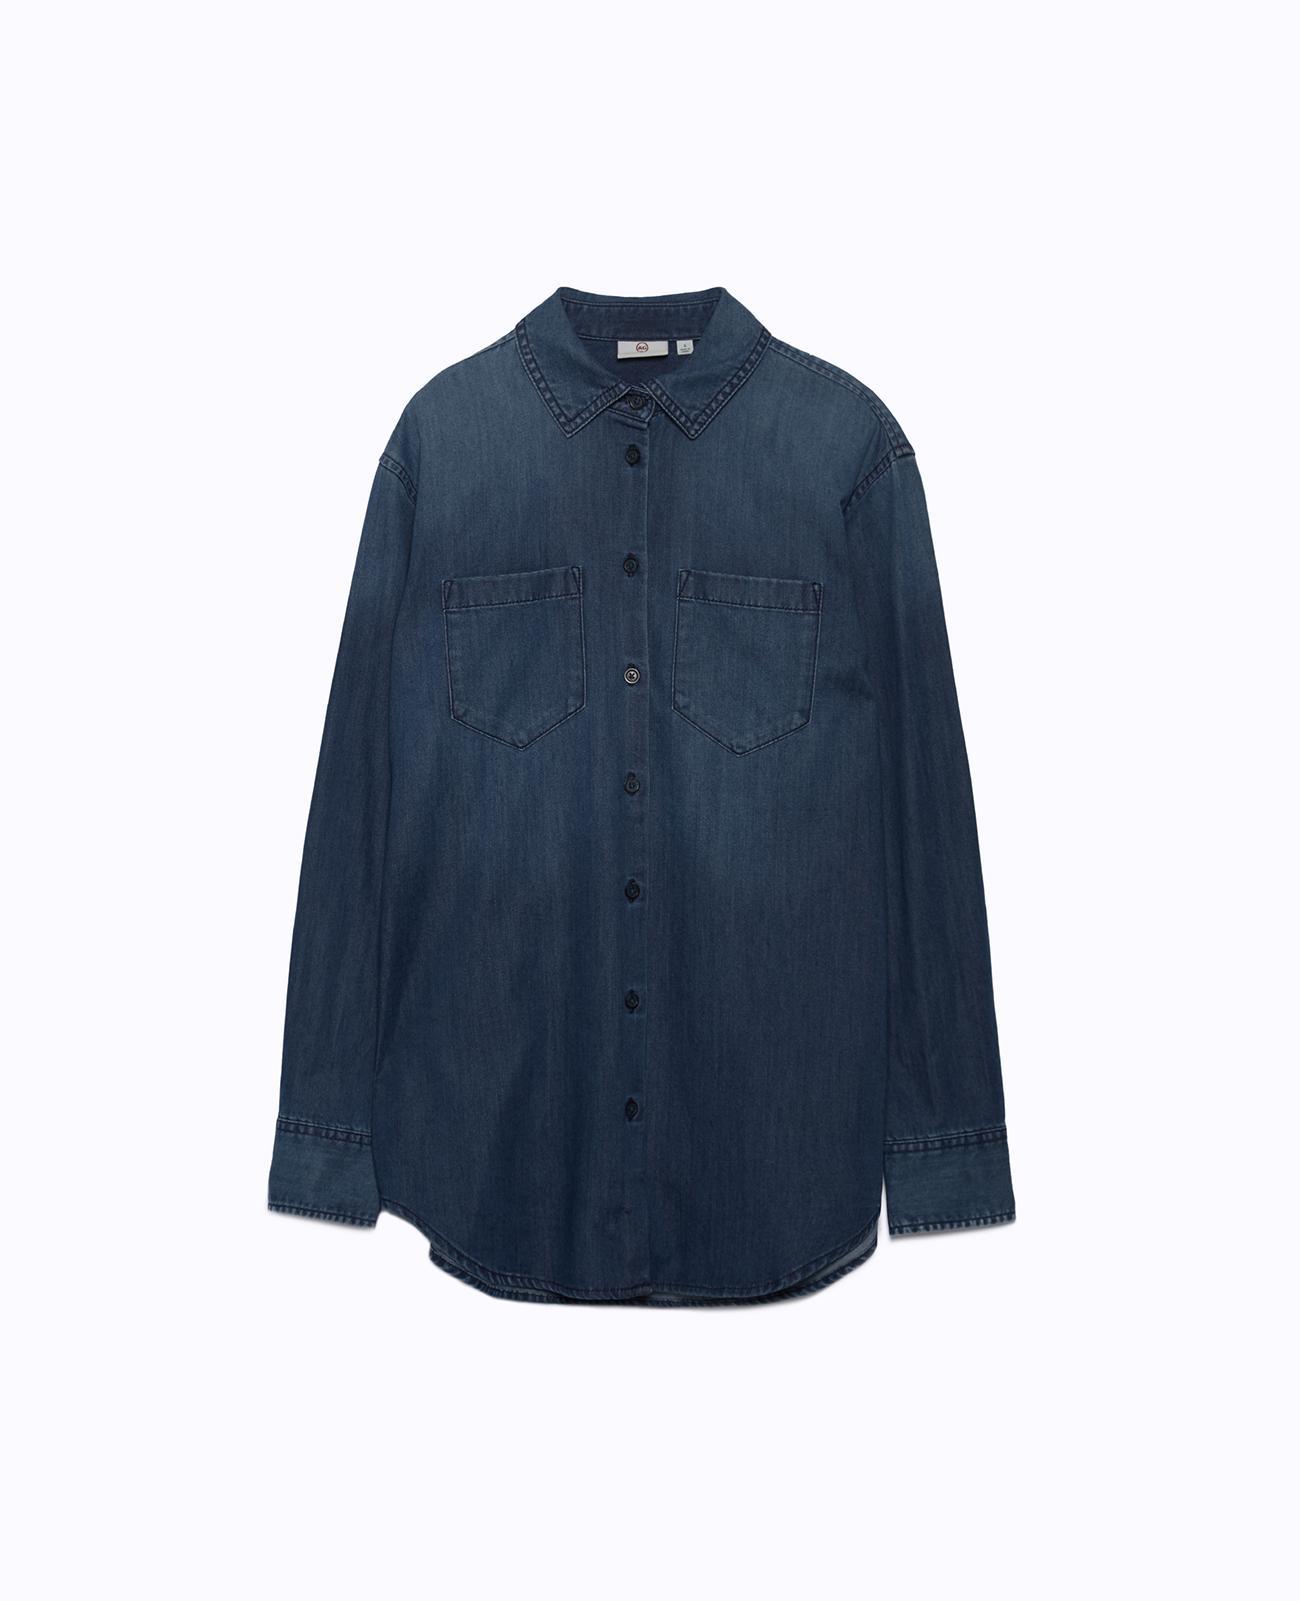 The Hartley Shirt